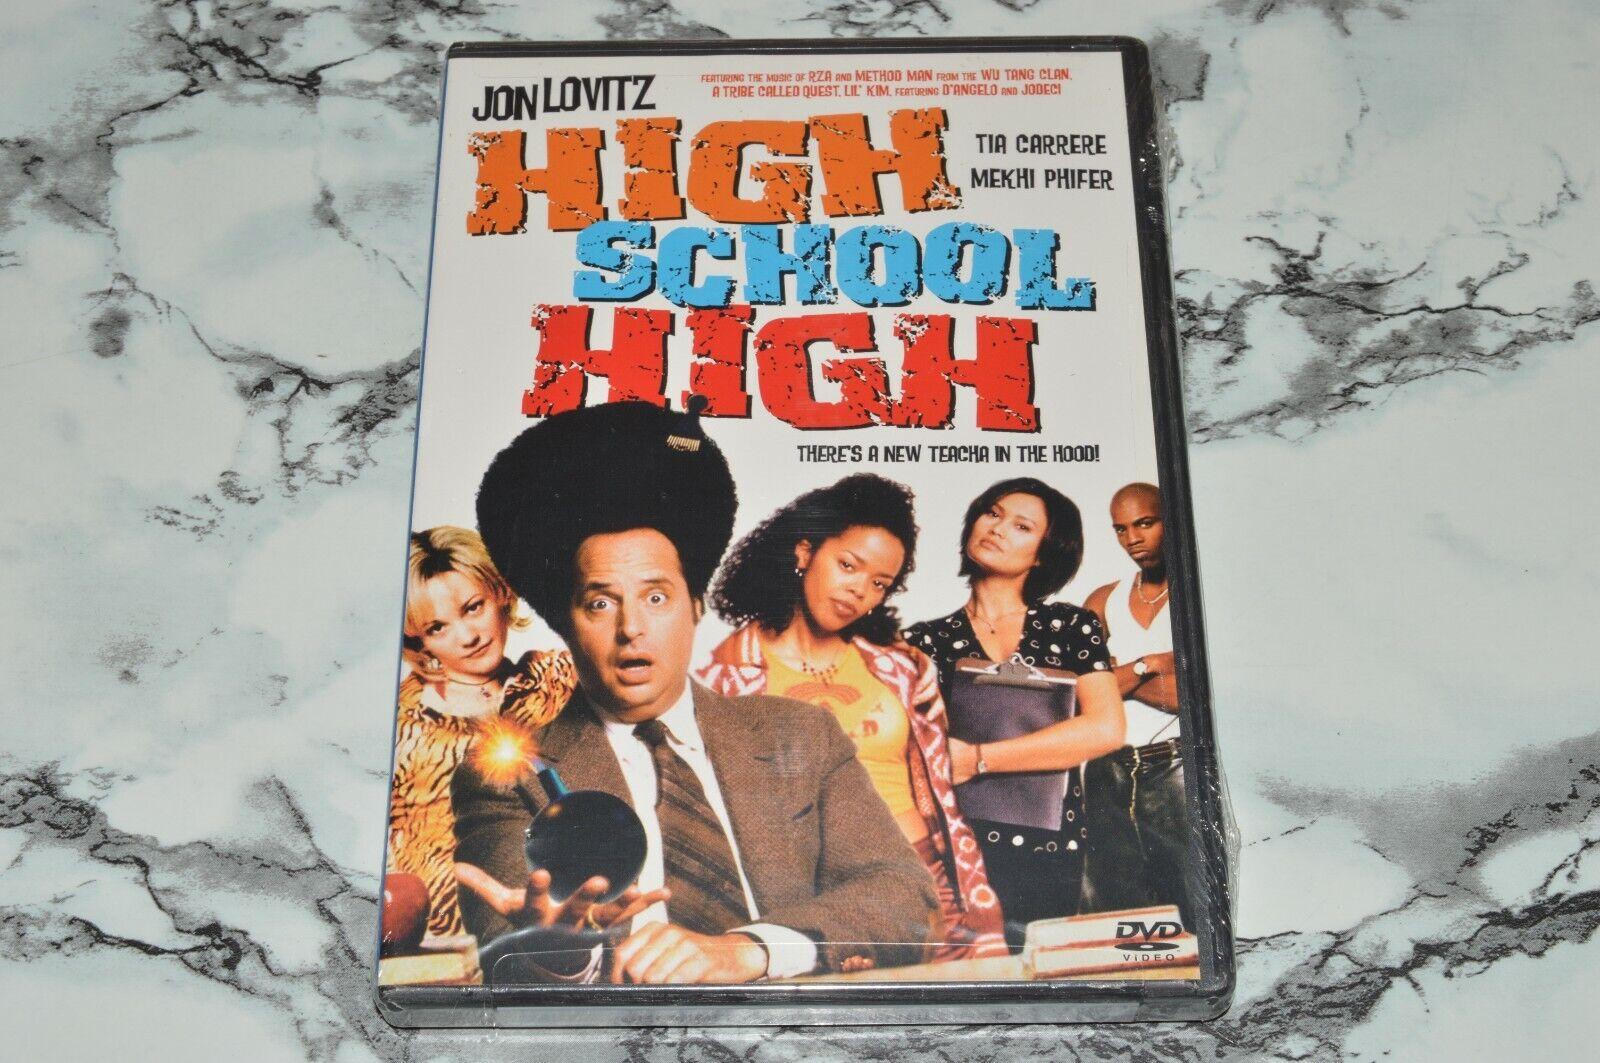 NEW - High School High DVD, 2004 -- Jon Lovitz Tia Carrere Mekhi Phifer - $12.68